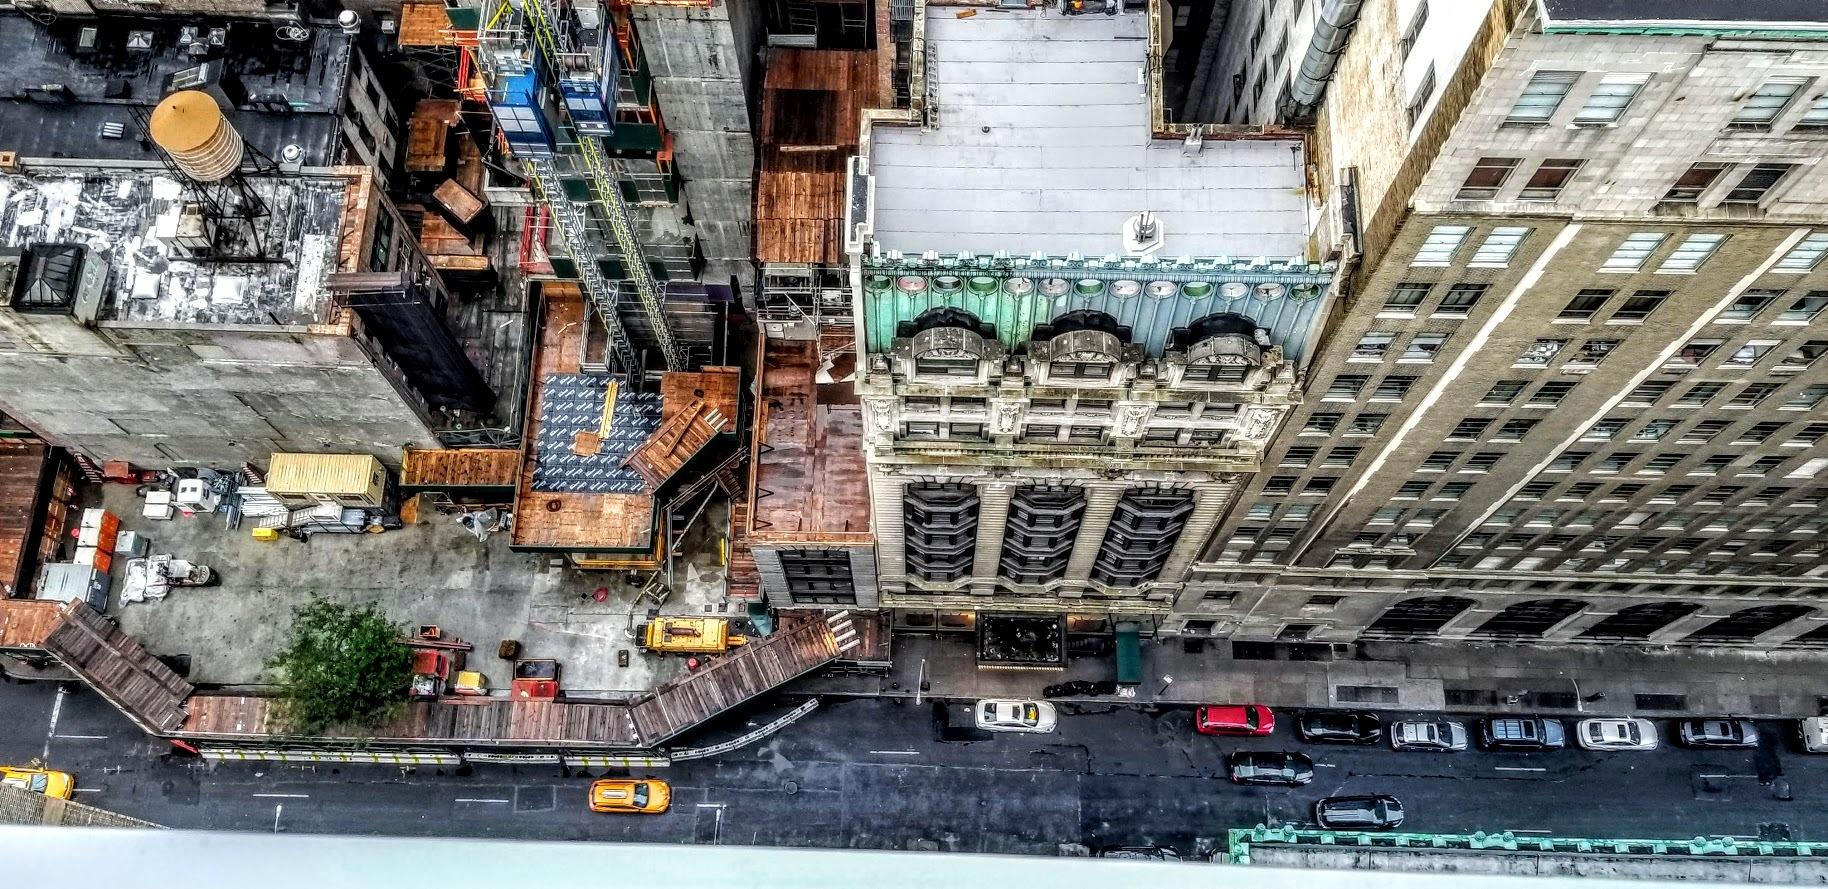 NYC Street View by Matthew Albertell